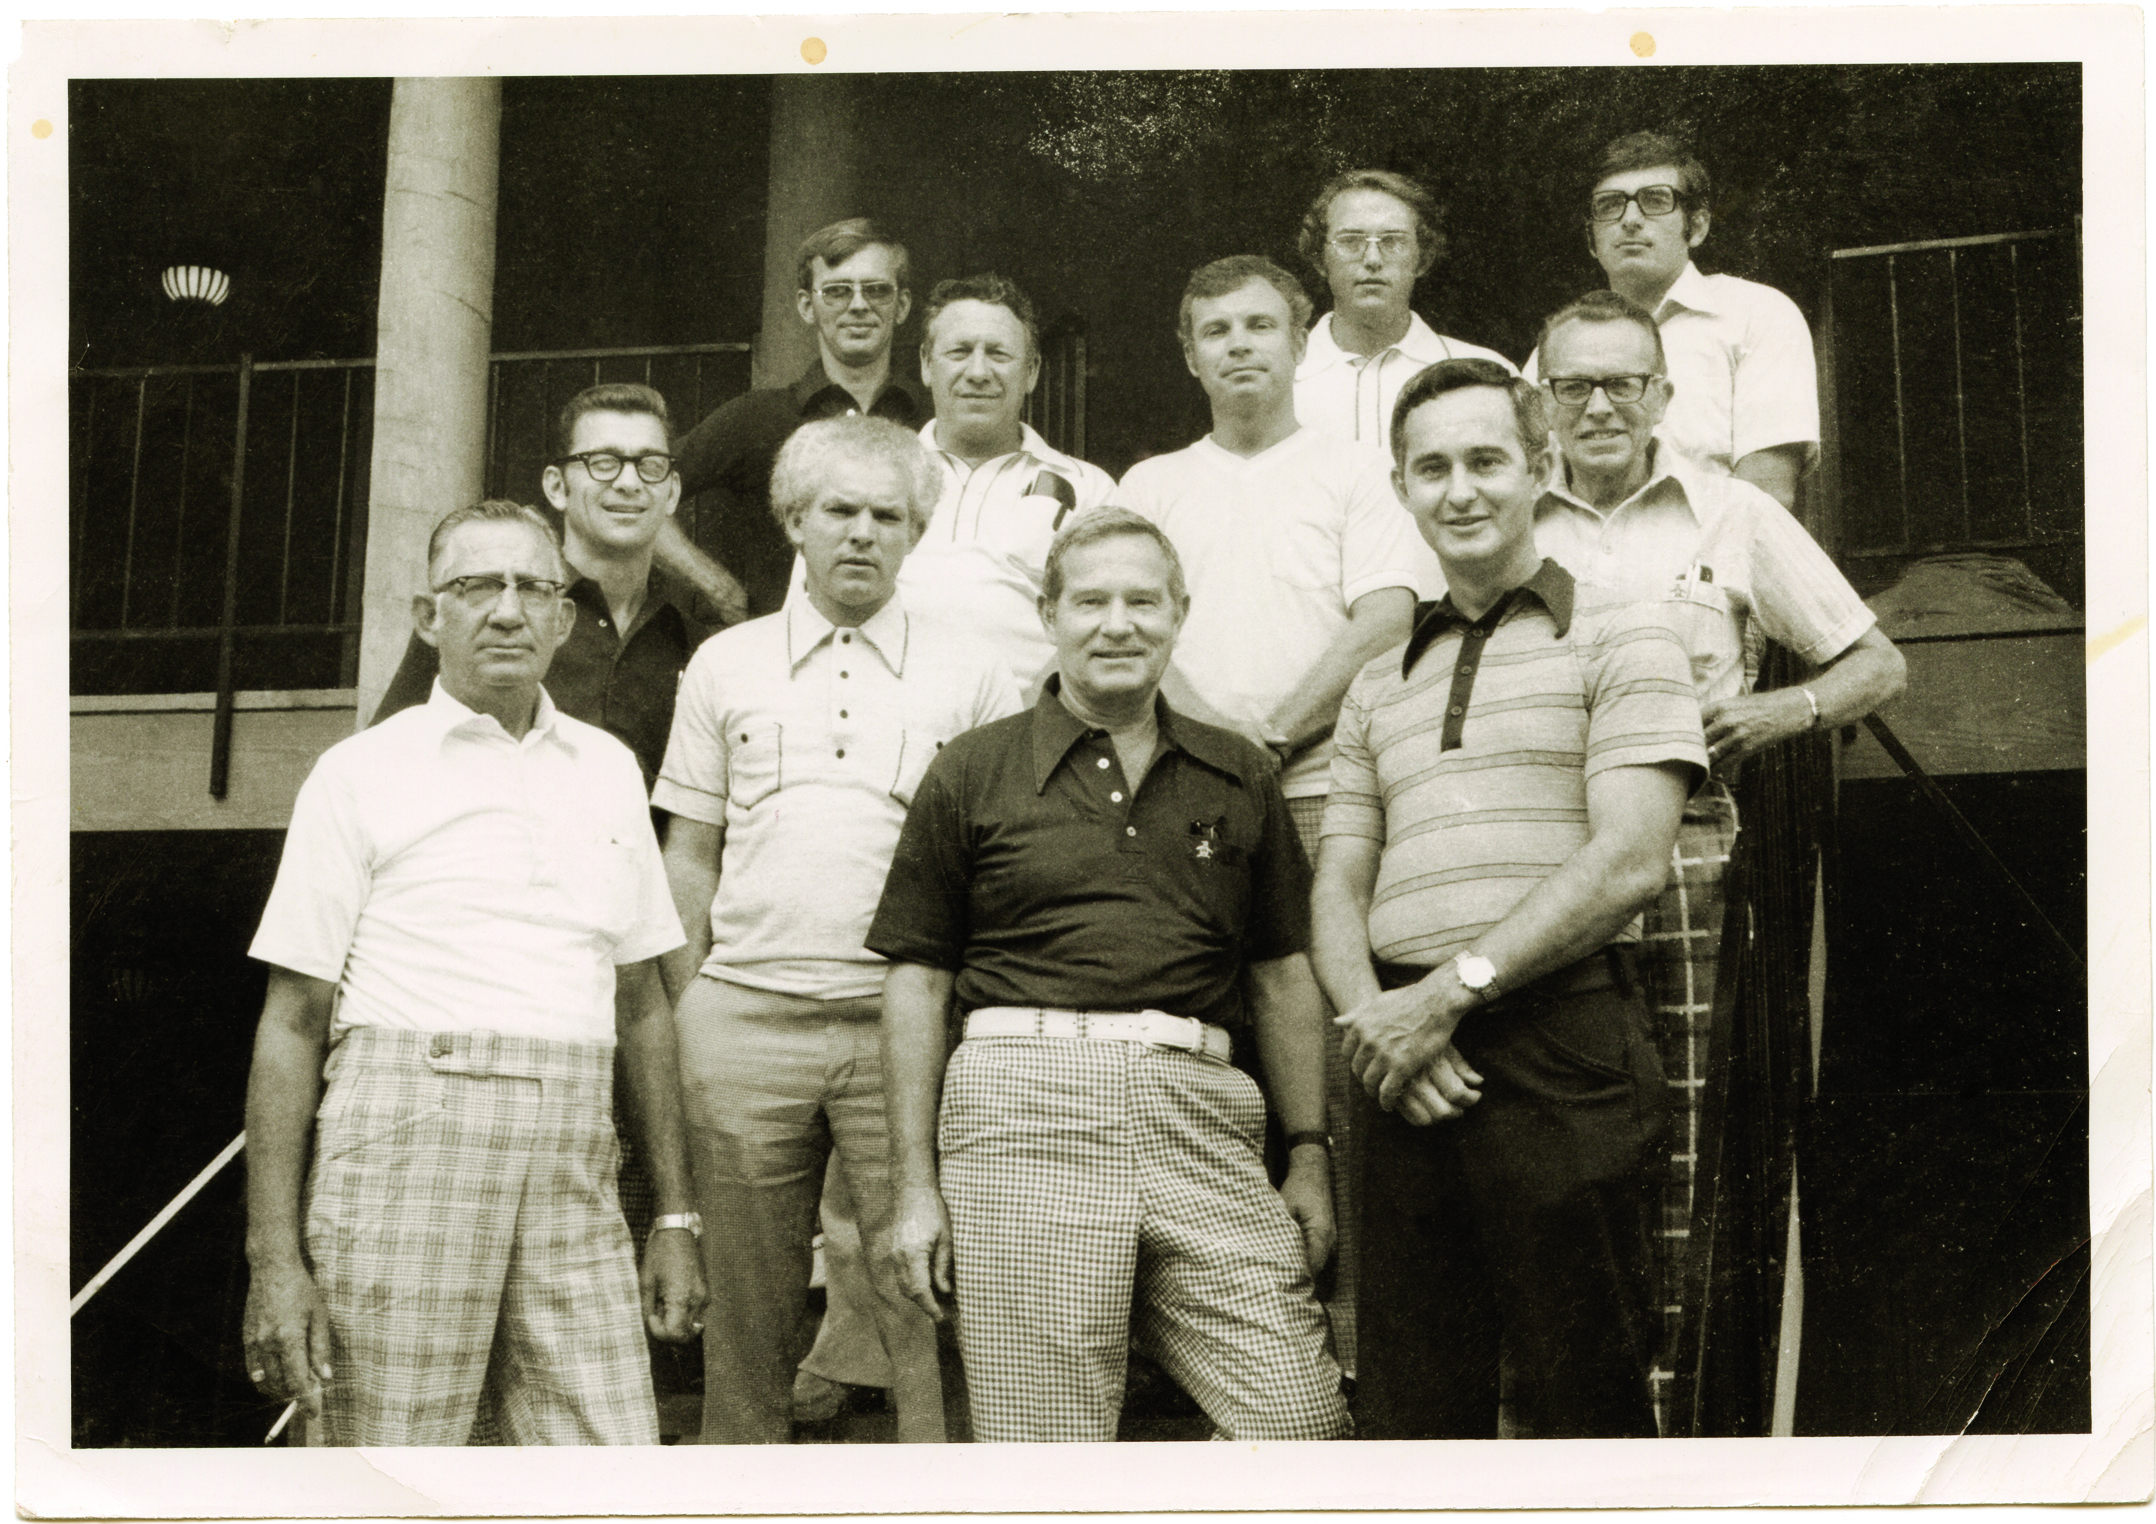 men posing for a photo